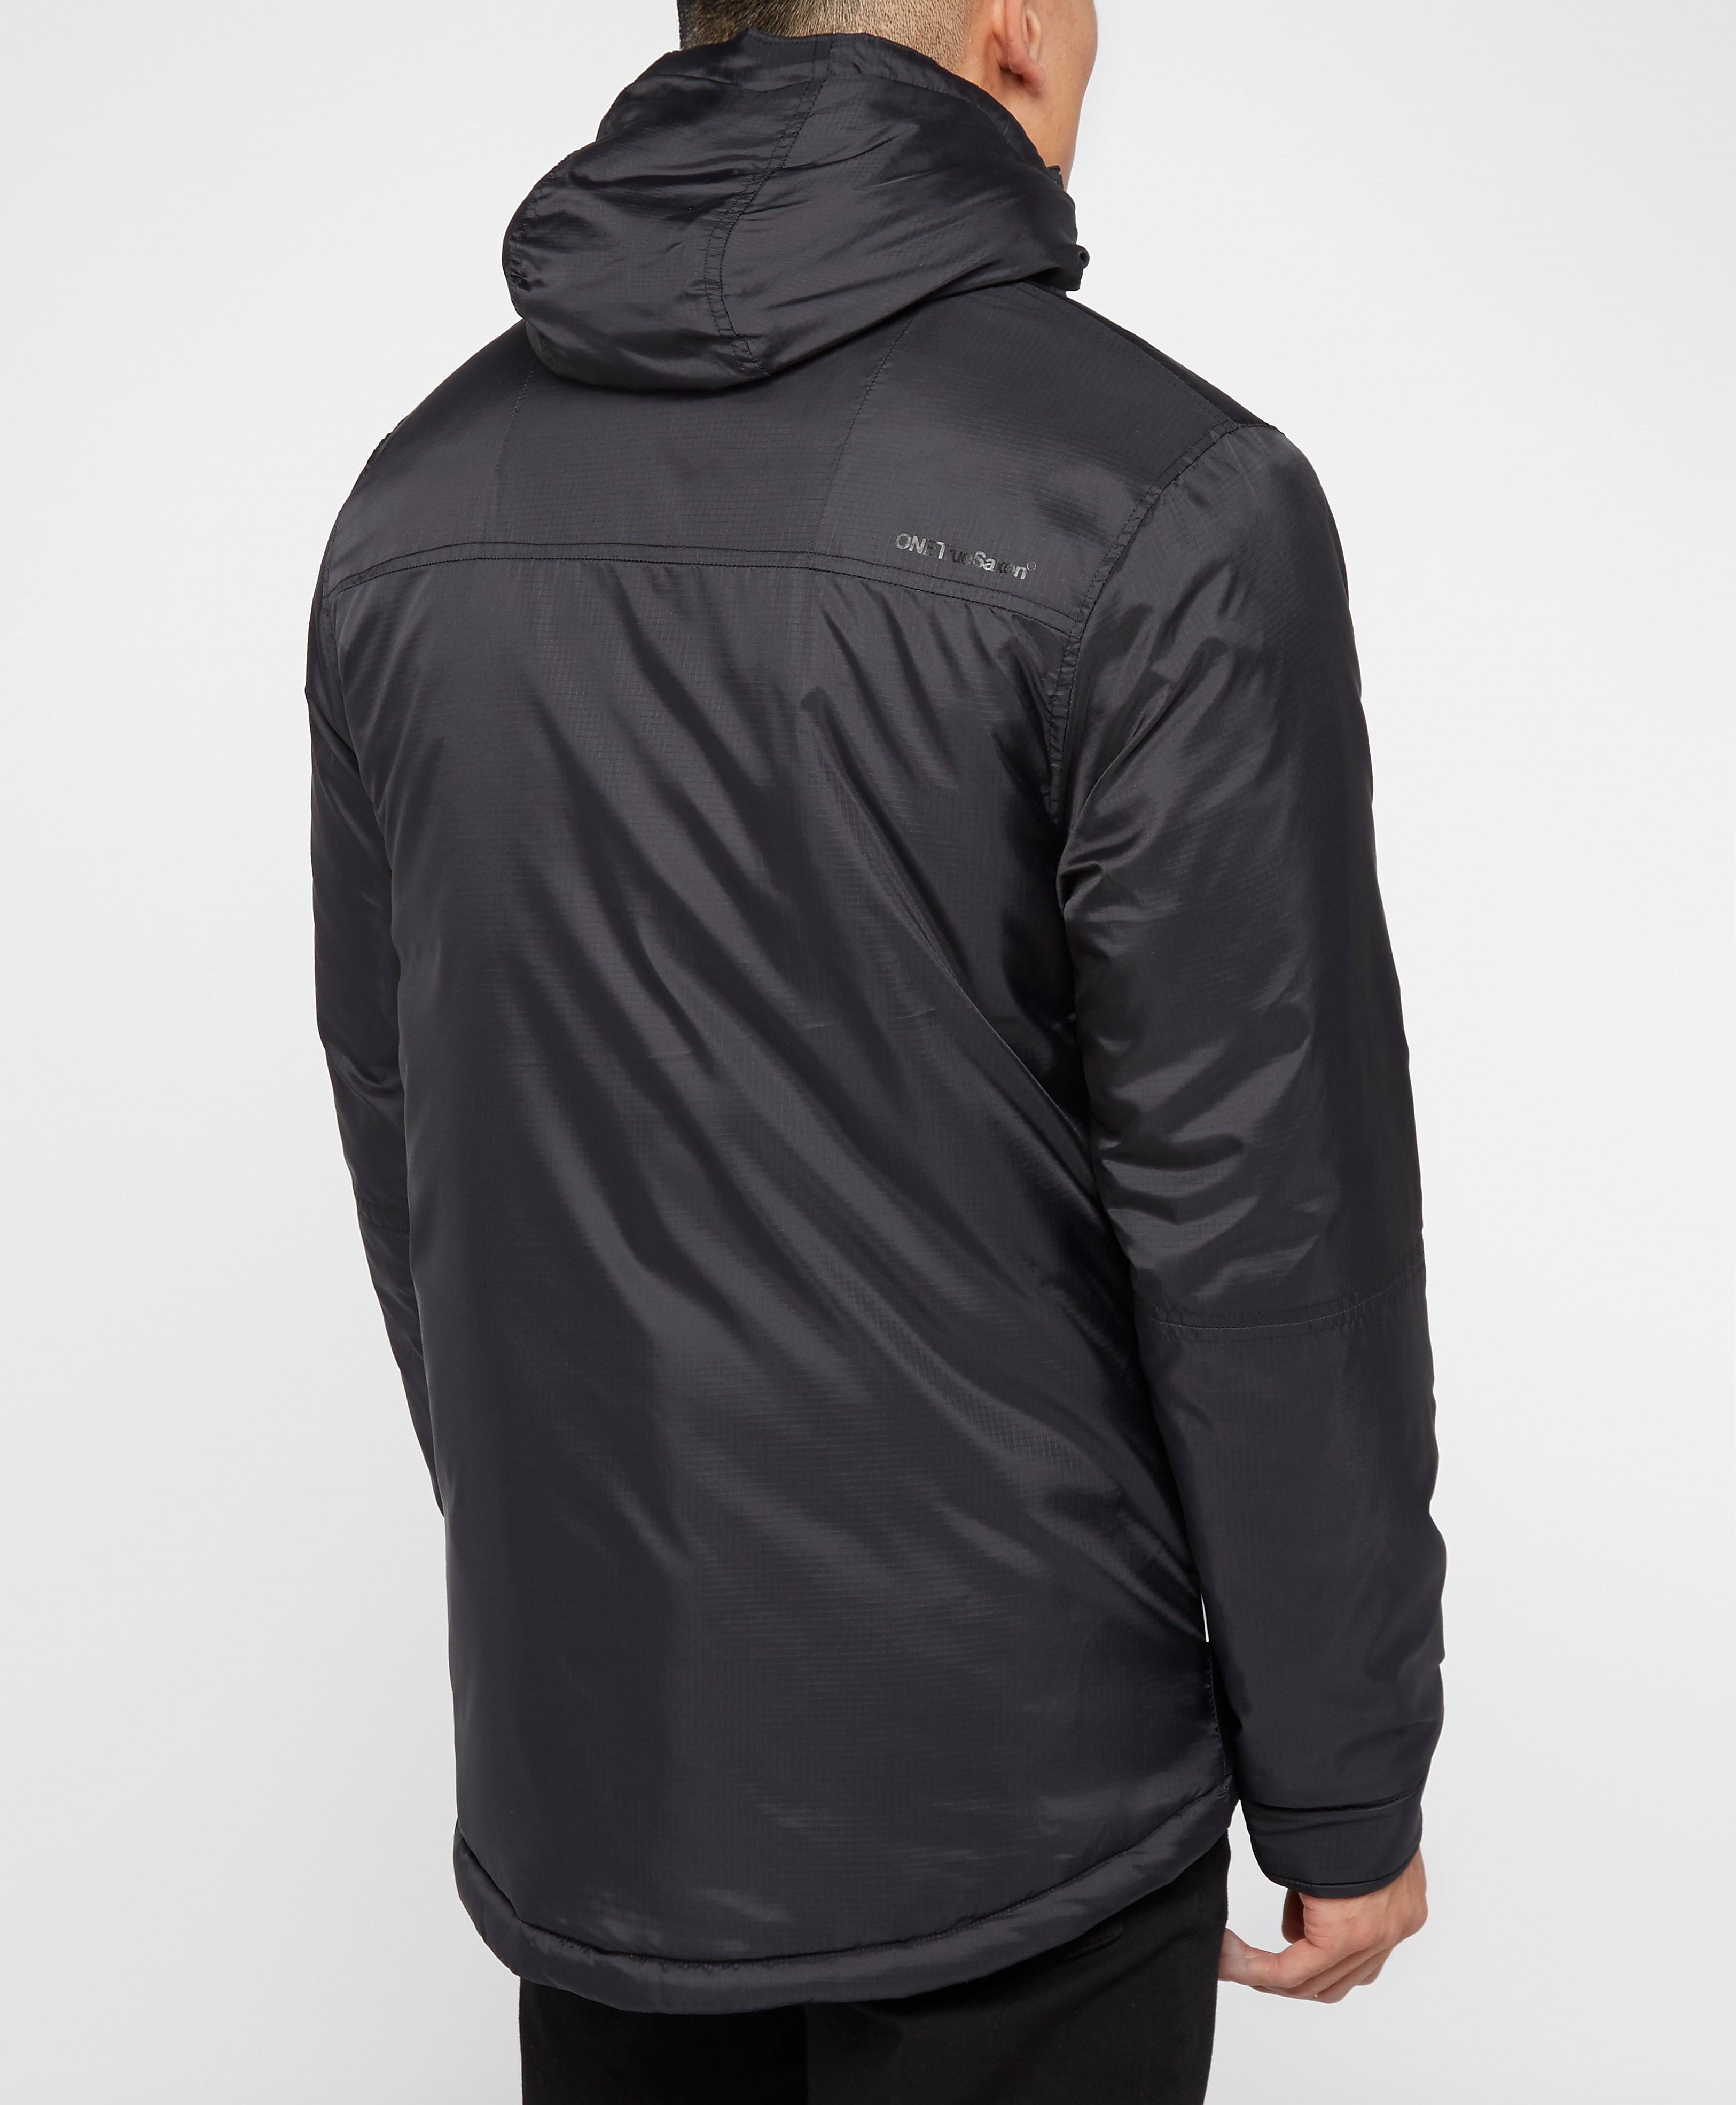 One True Saxon Ave Jacket- Exclusive